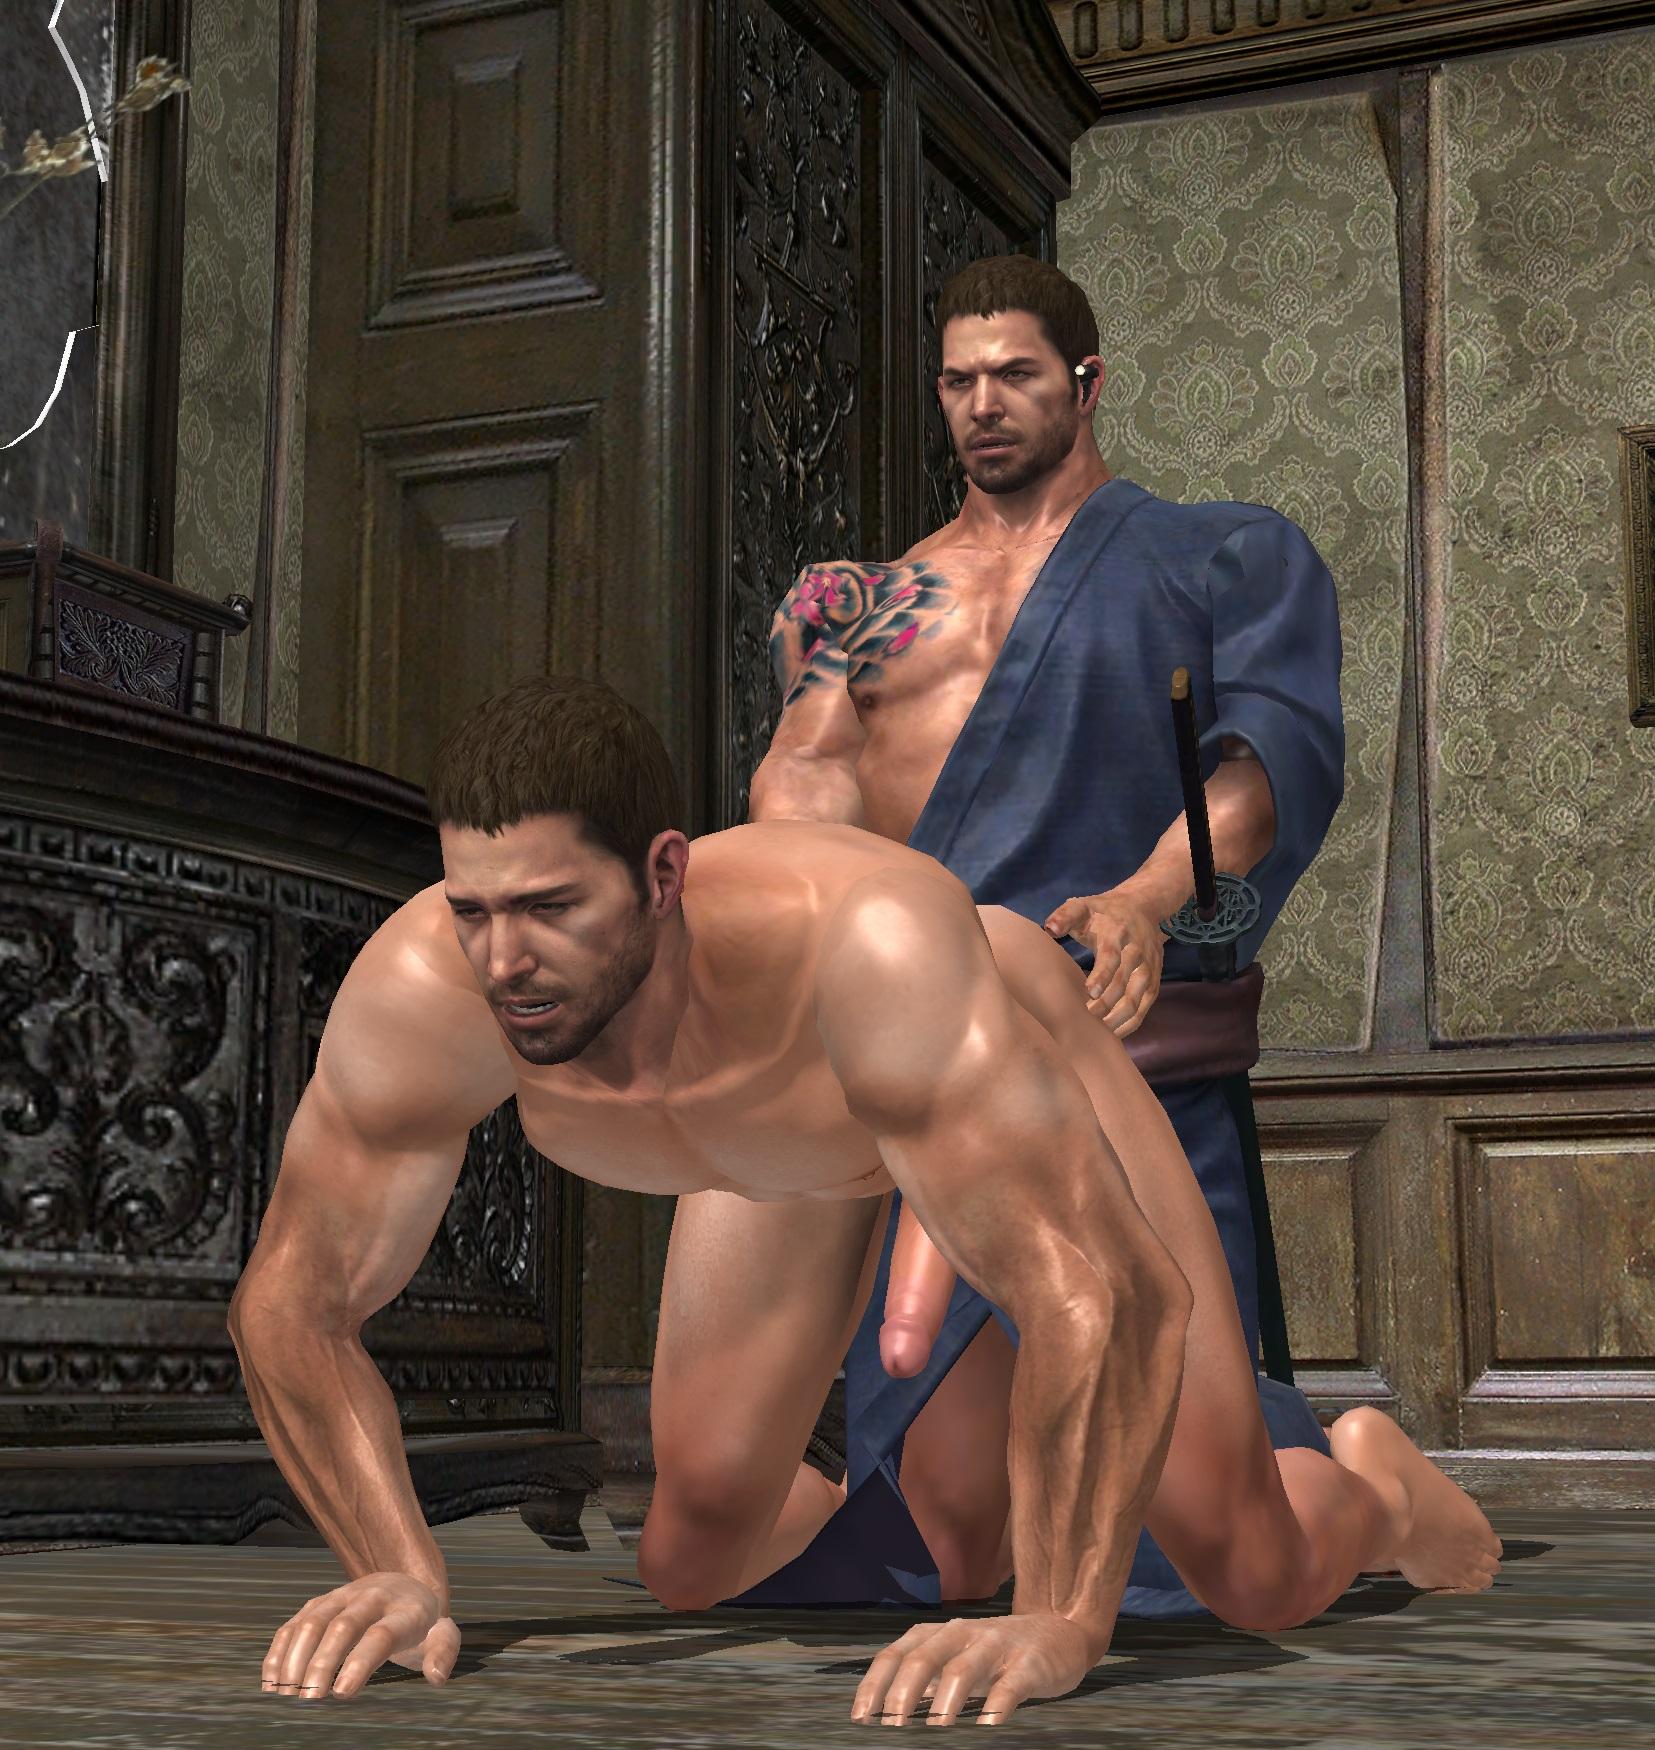 3D Gay Porn Games resident evil gay porn videos hentai videos